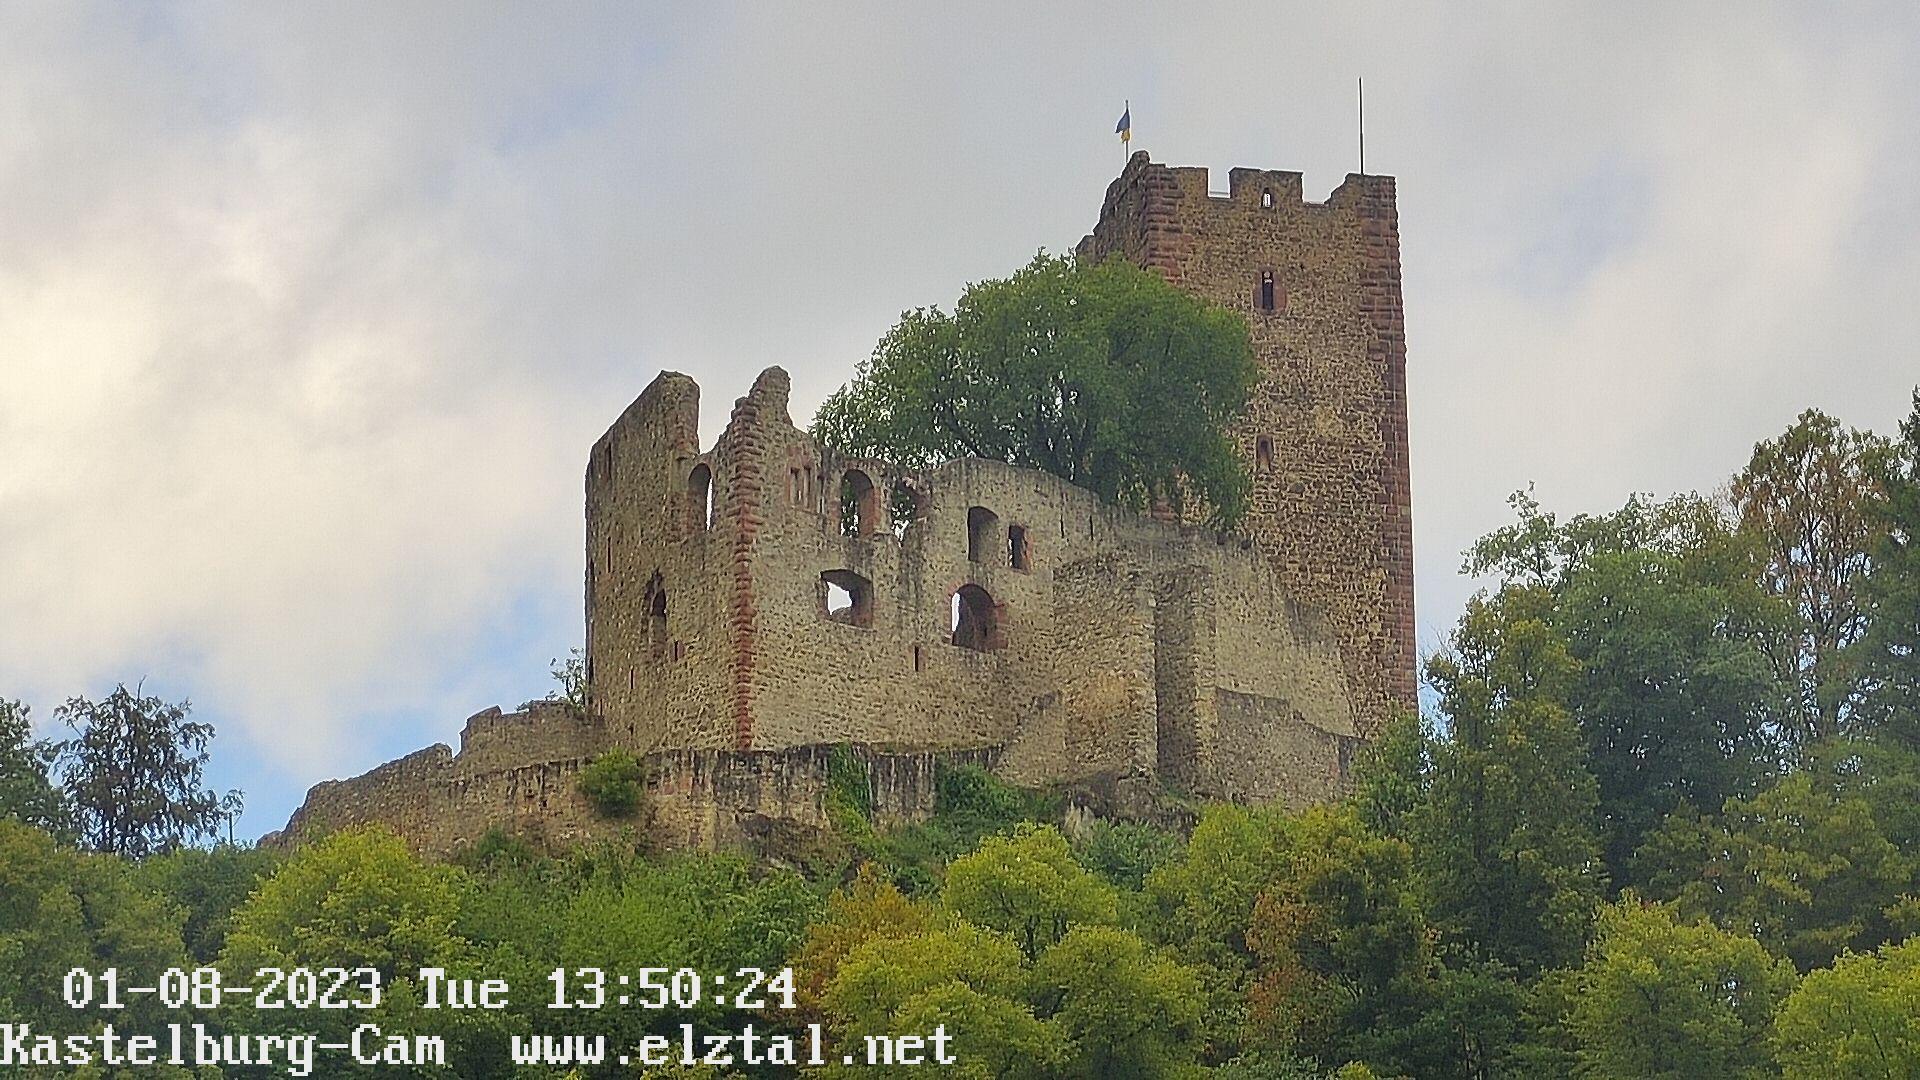 Waldkirch Wed. 13:55